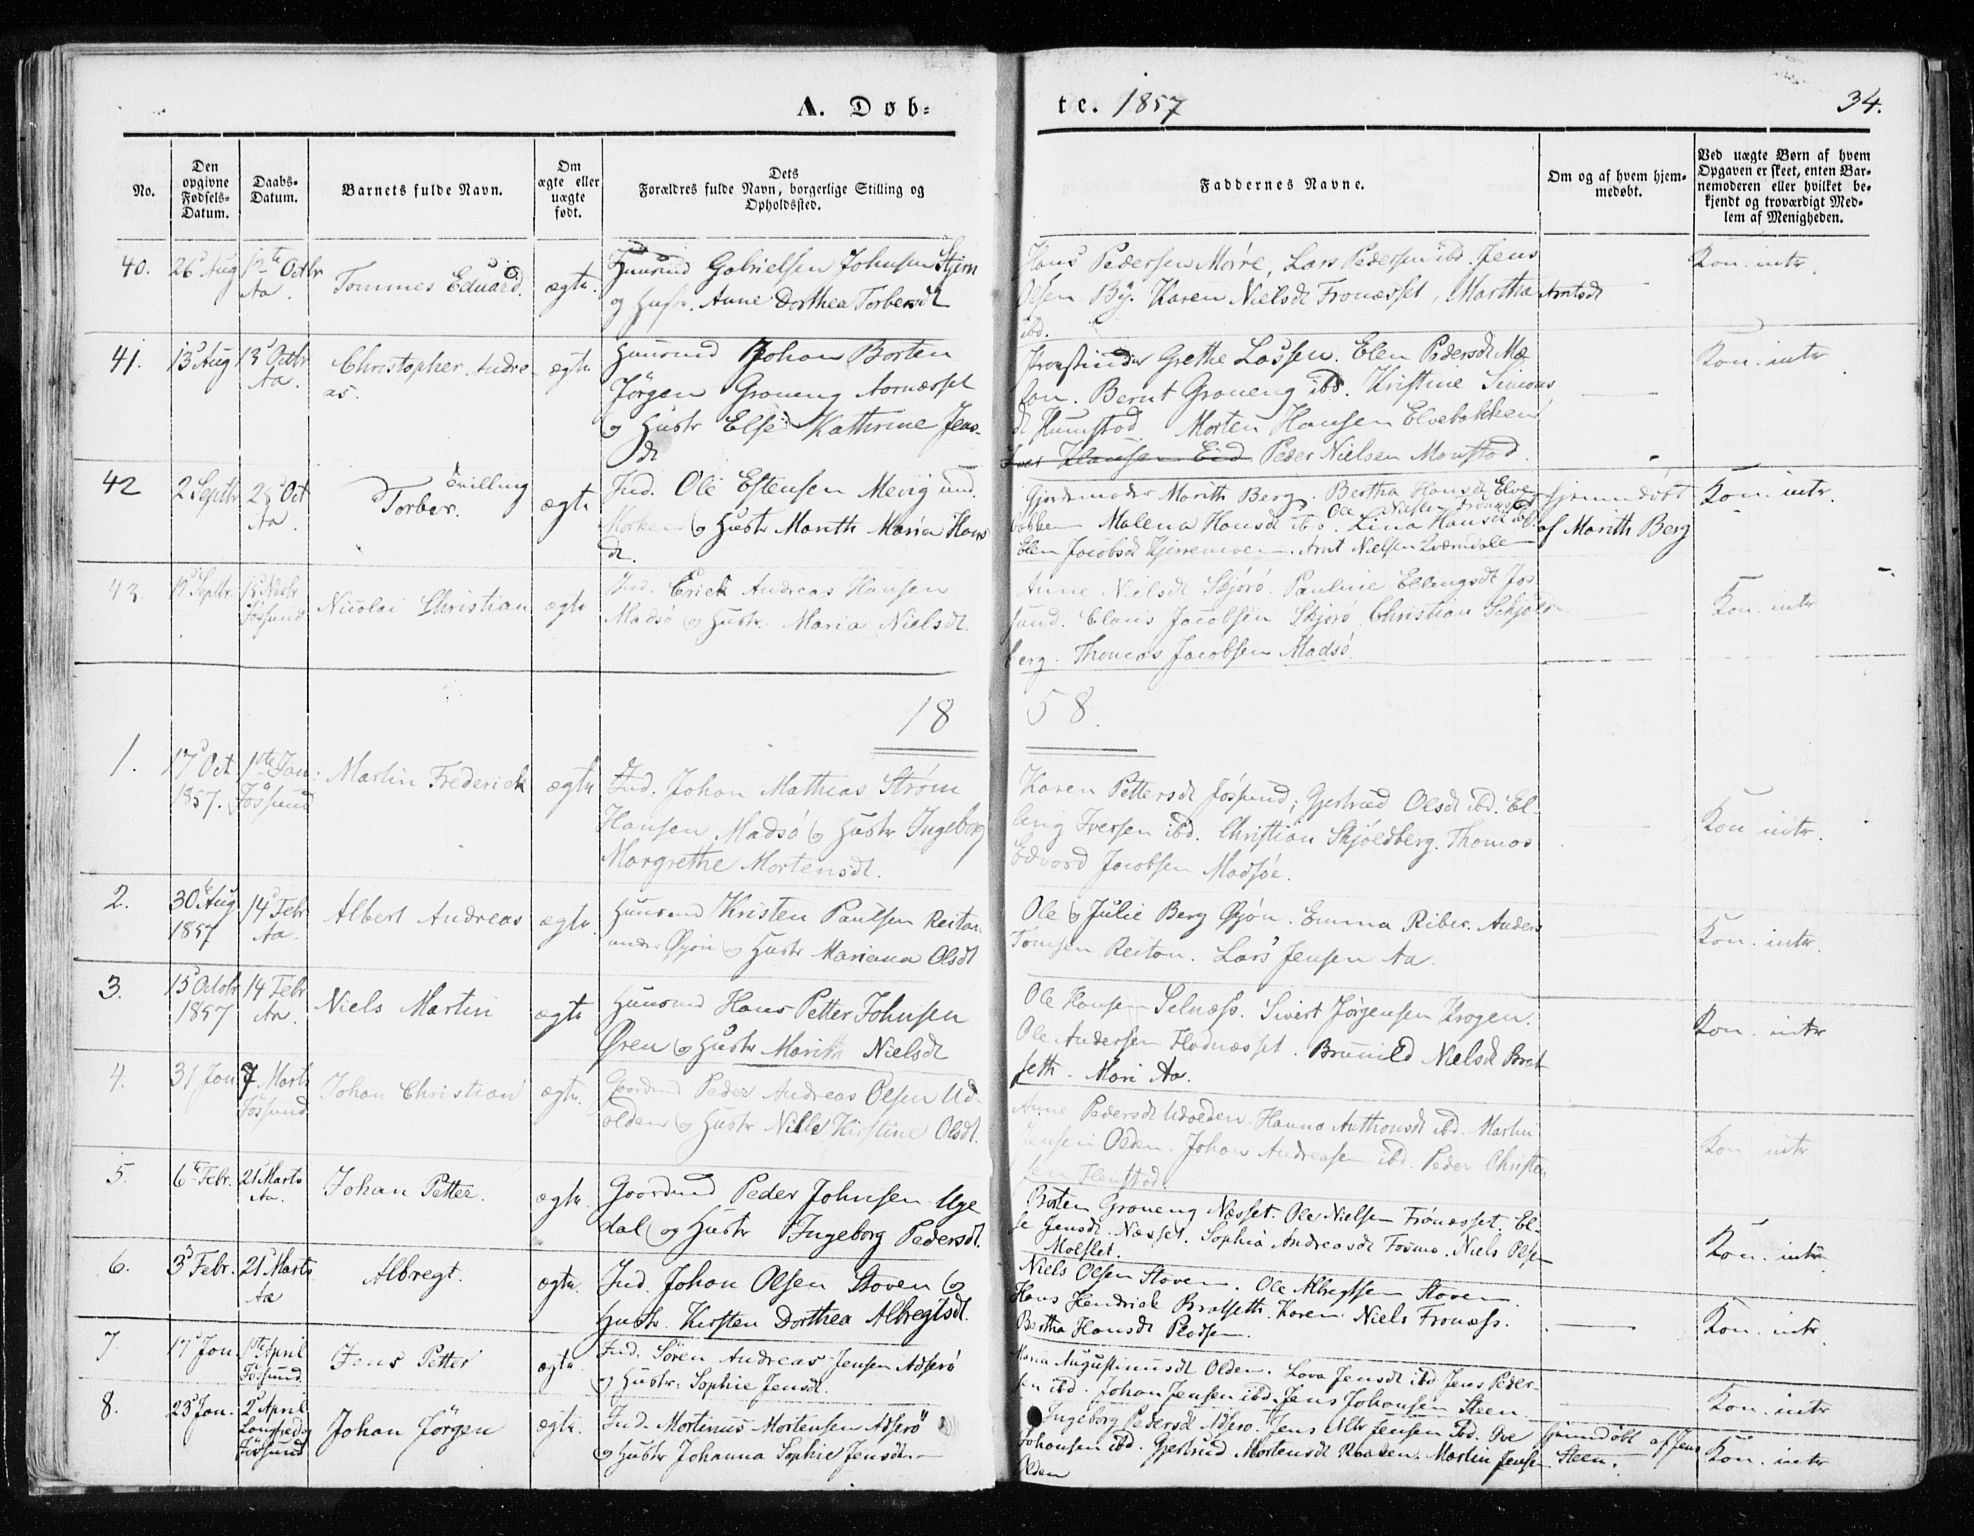 SAT, Ministerialprotokoller, klokkerbøker og fødselsregistre - Sør-Trøndelag, 655/L0677: Parish register (official) no. 655A06, 1847-1860, p. 34